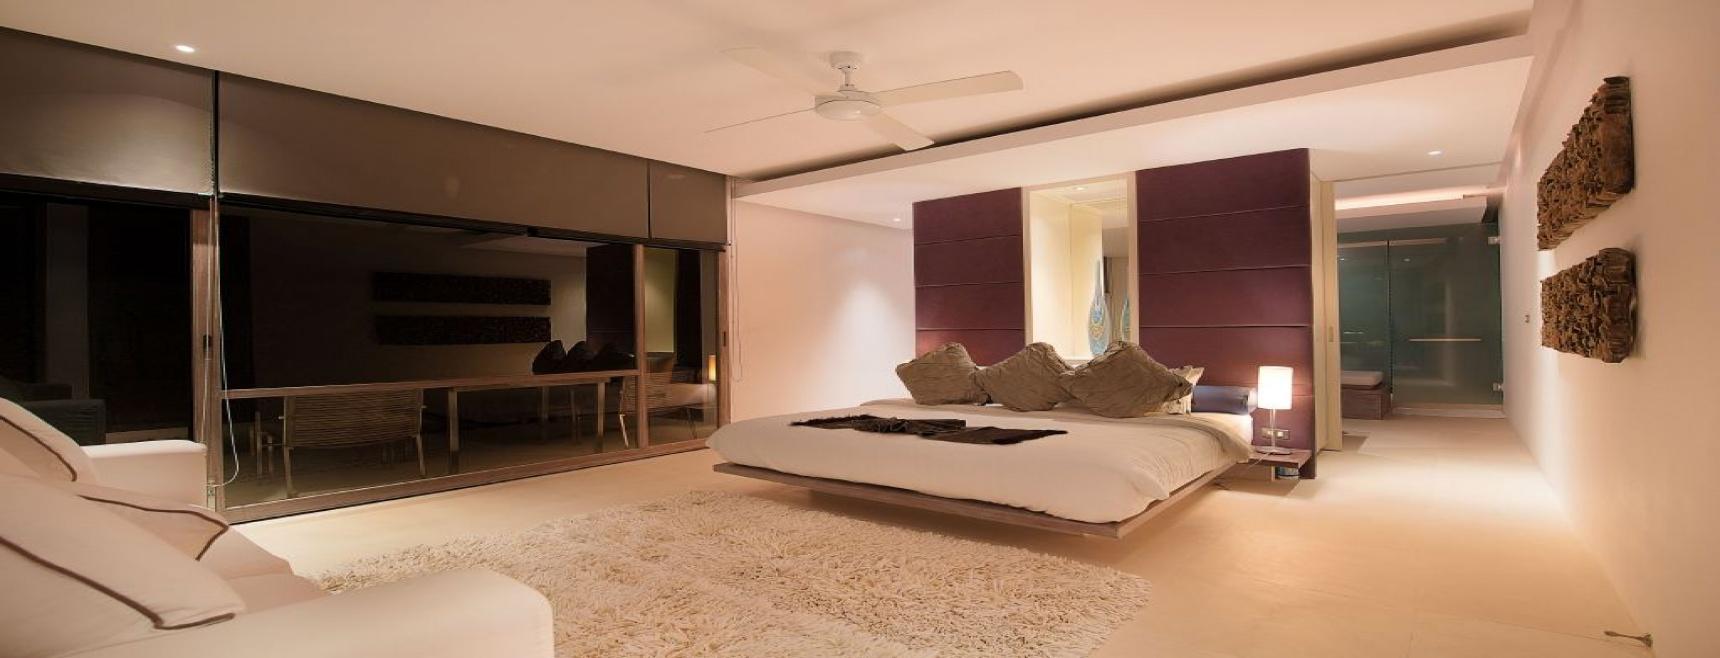 Choeng Mon, North East, Koh Samui, 4 Bedrooms Bedrooms, ,Villa,Holiday Villa Rentals,1101